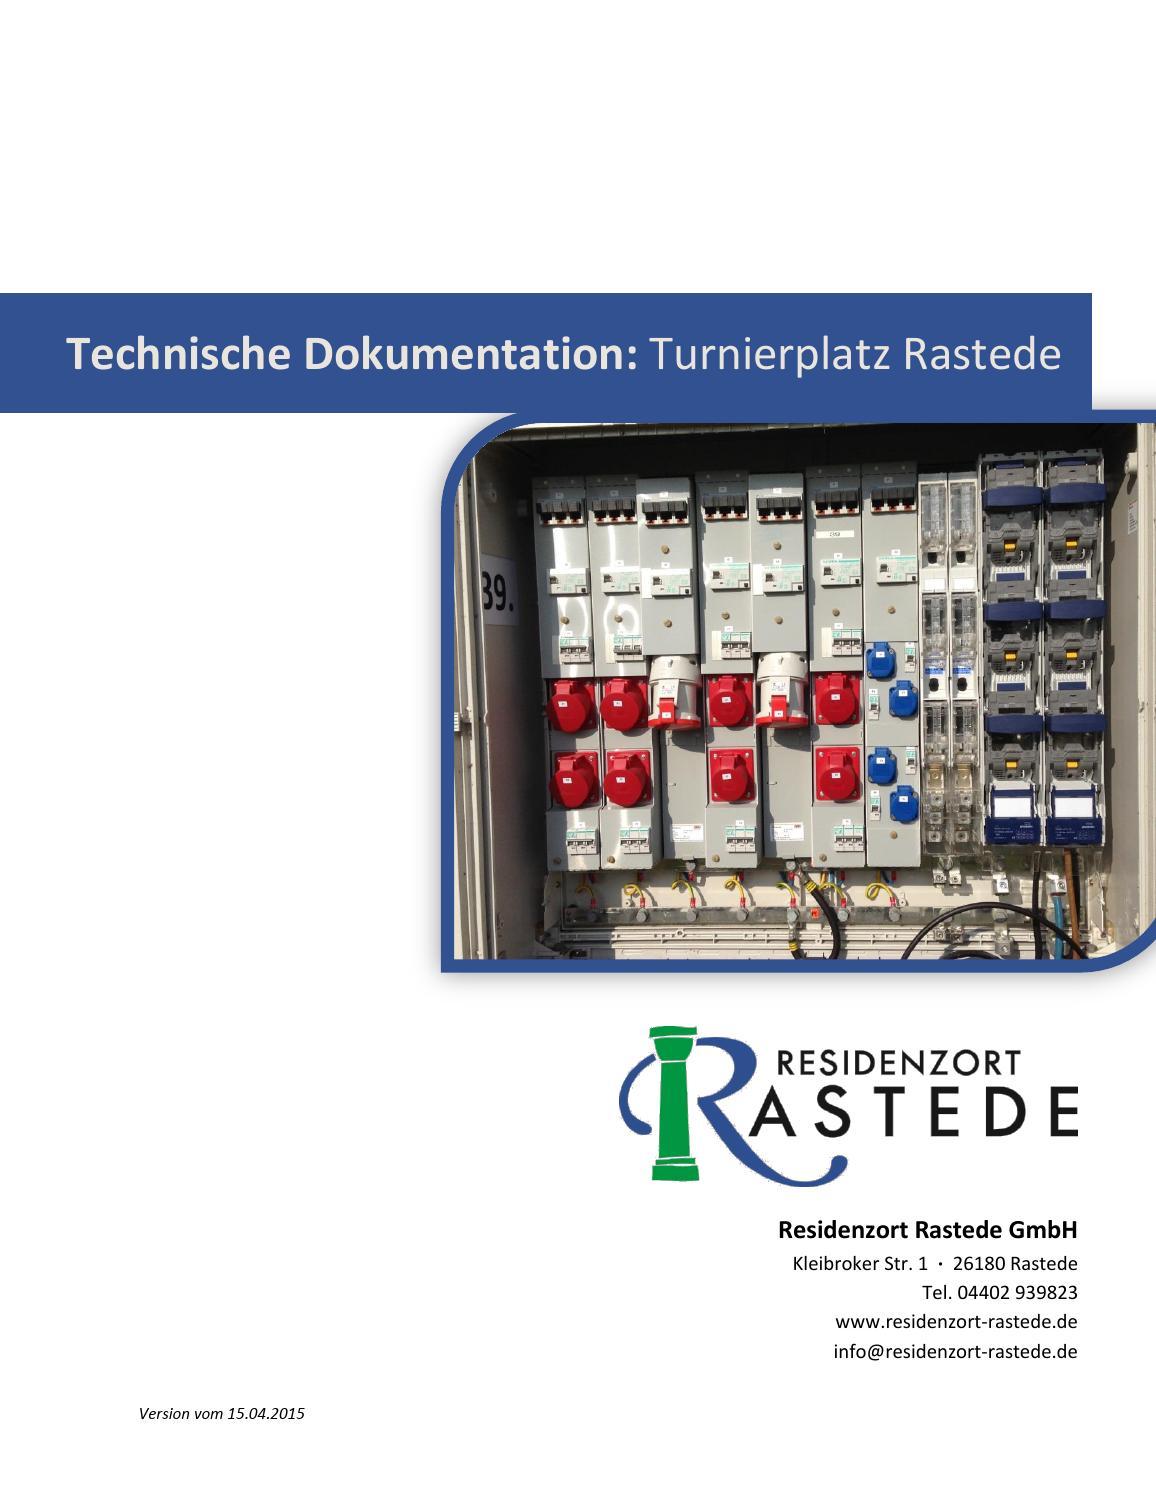 Technische Dokumentation: Turnierplatz Rastede by Residenzort ...